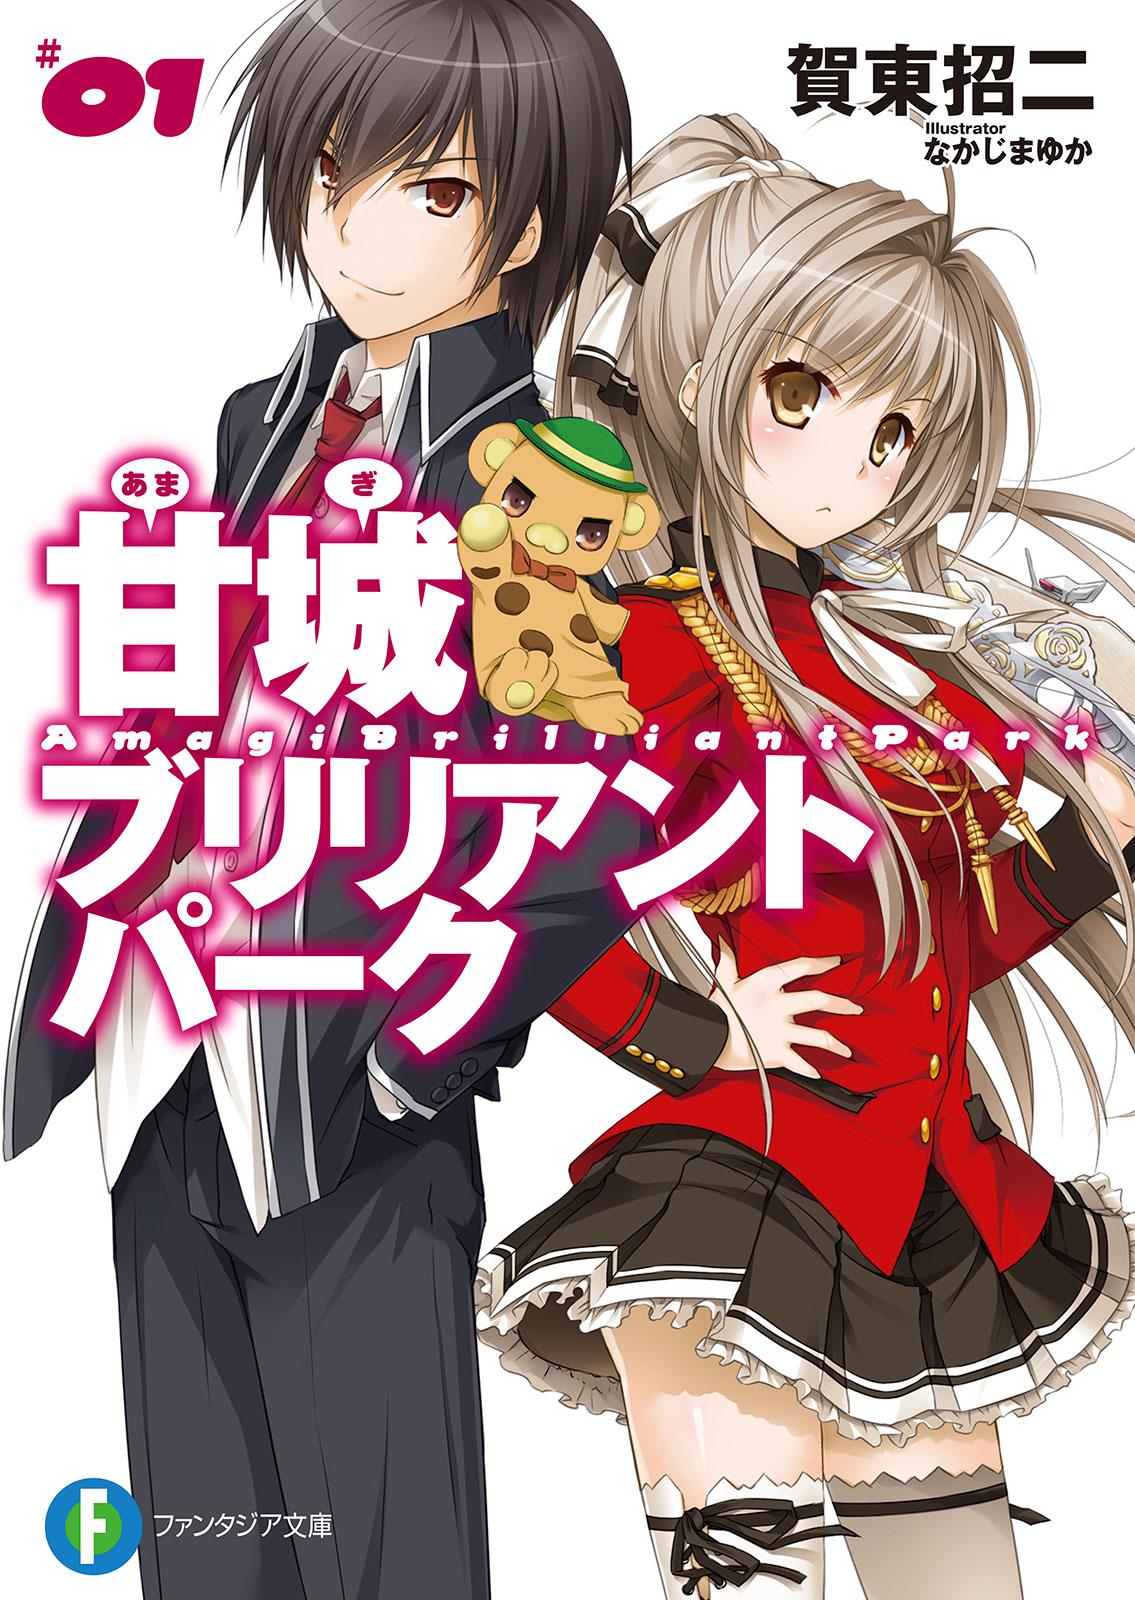 [Light Novel] Amagi Brilliant Park Cover-image